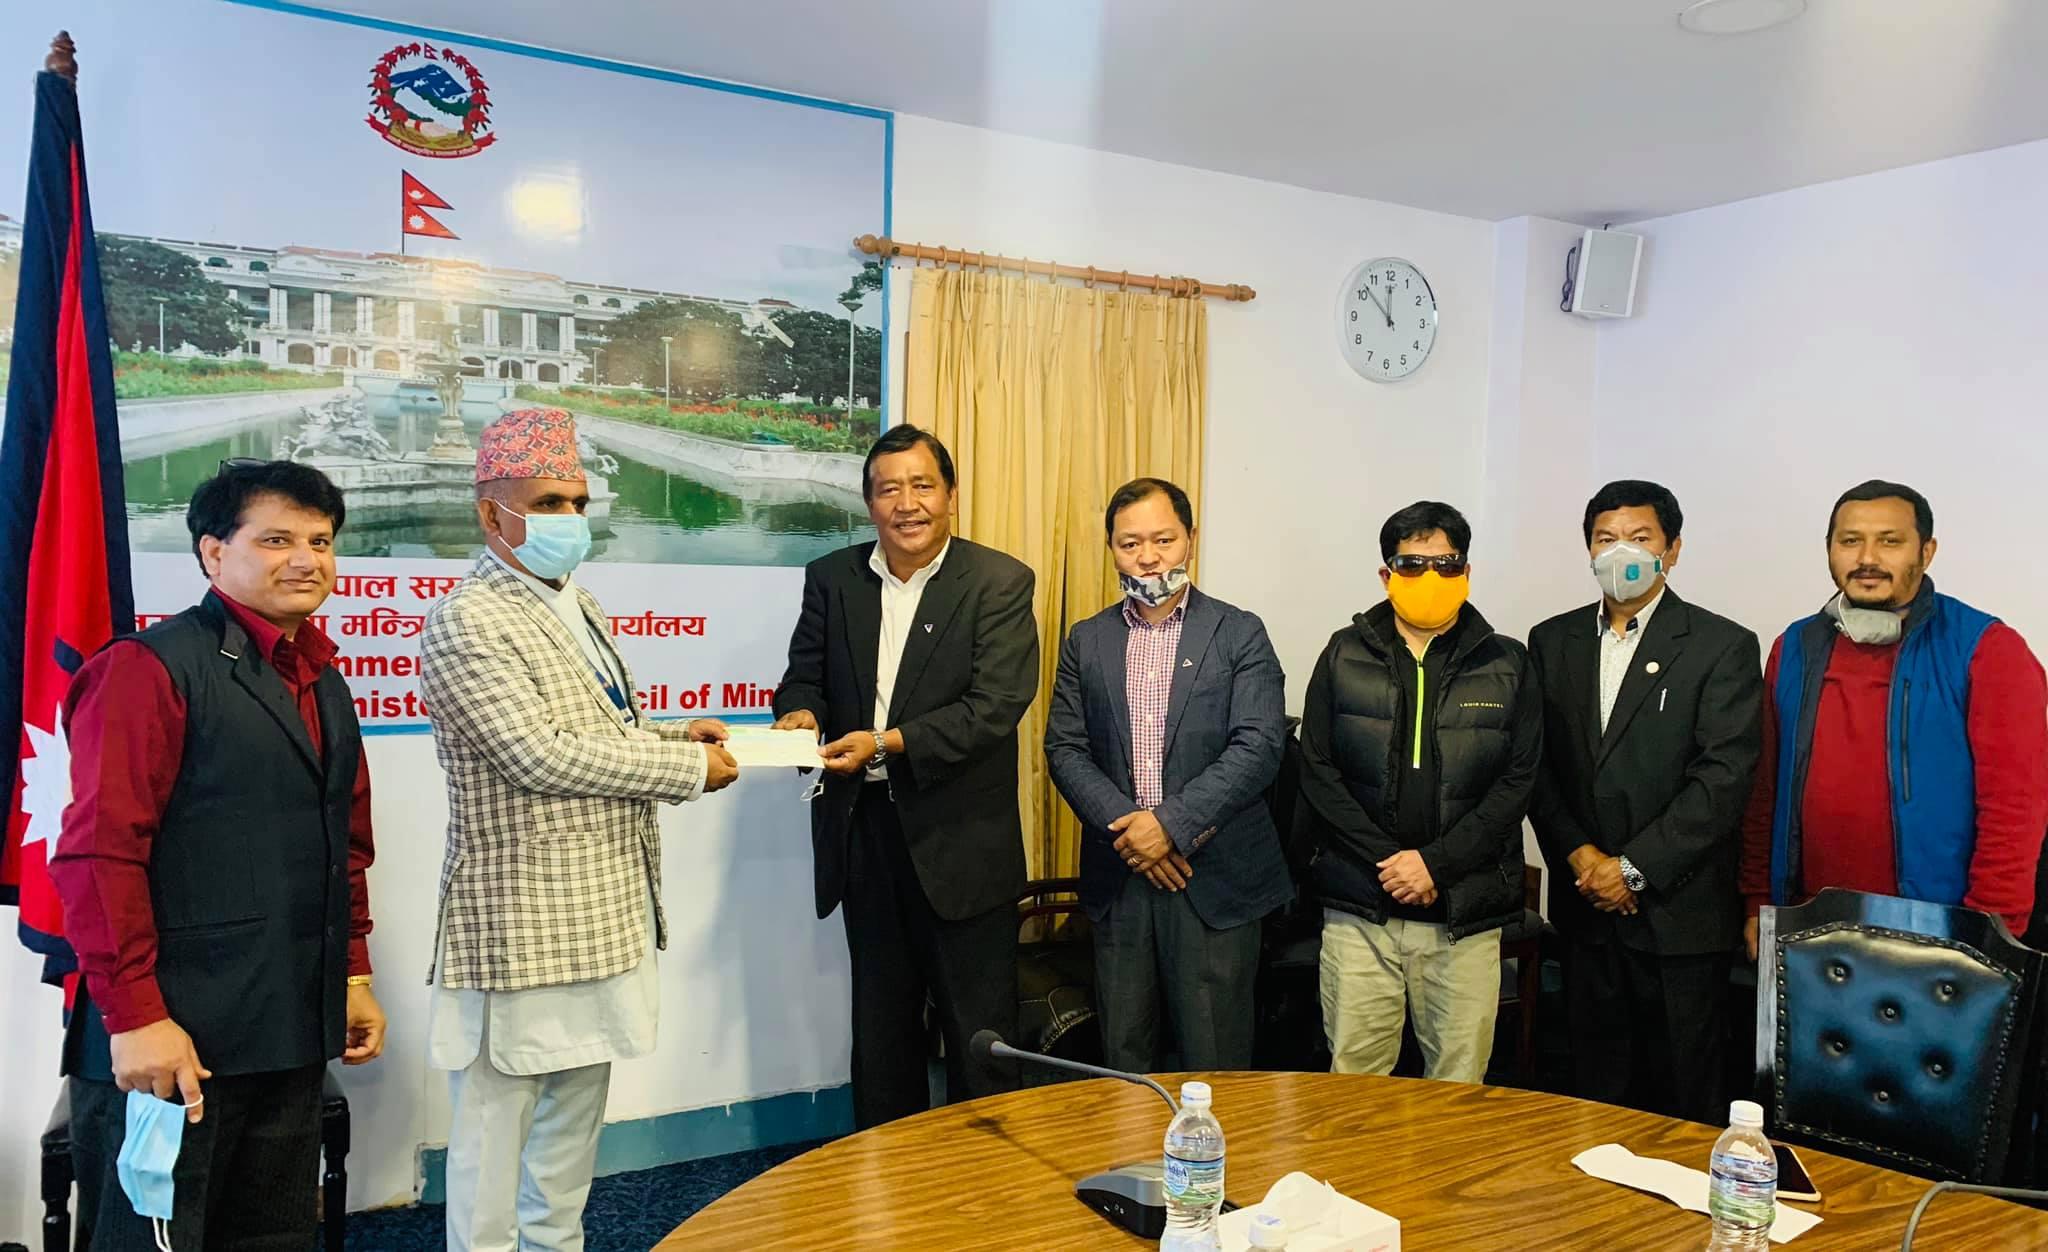 NMA President Santa Bir Lama is handing over cheque to the Mahendra Prasad Guragai. Photo: Nepal Mountaineering Association